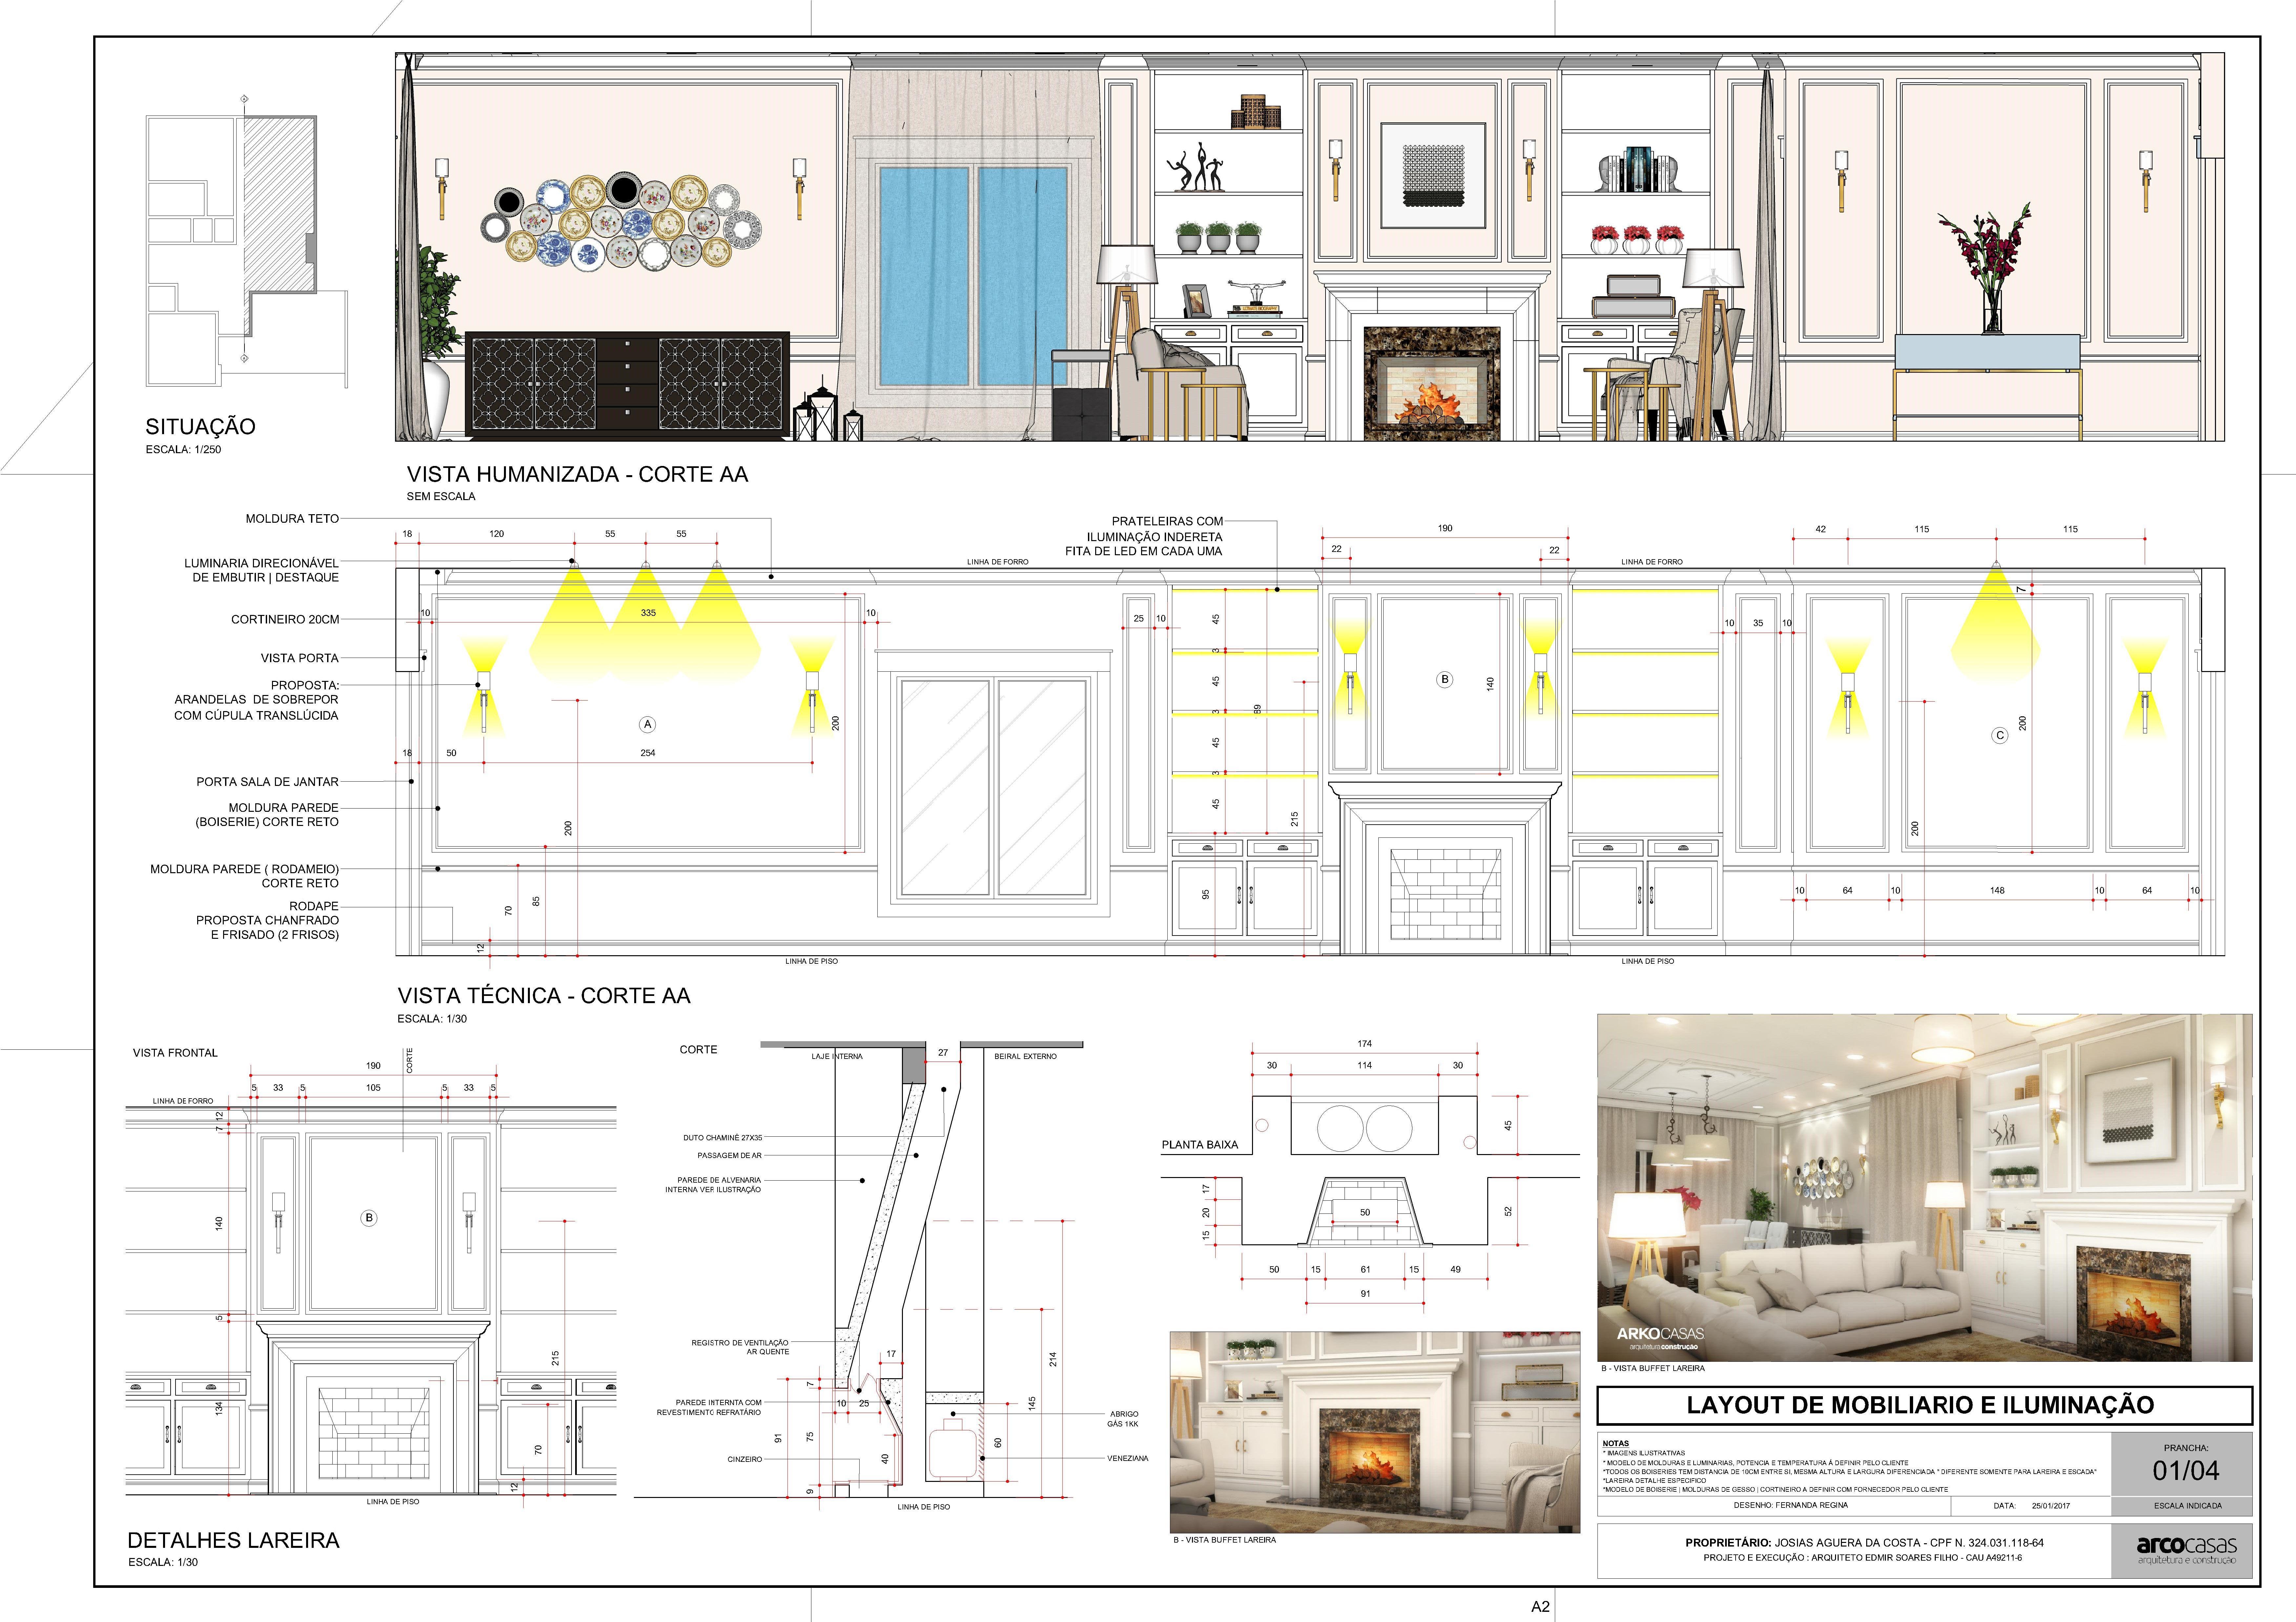 Projeto De Pagina O Boiserie Ilumina O Interior 3d Ilustra O